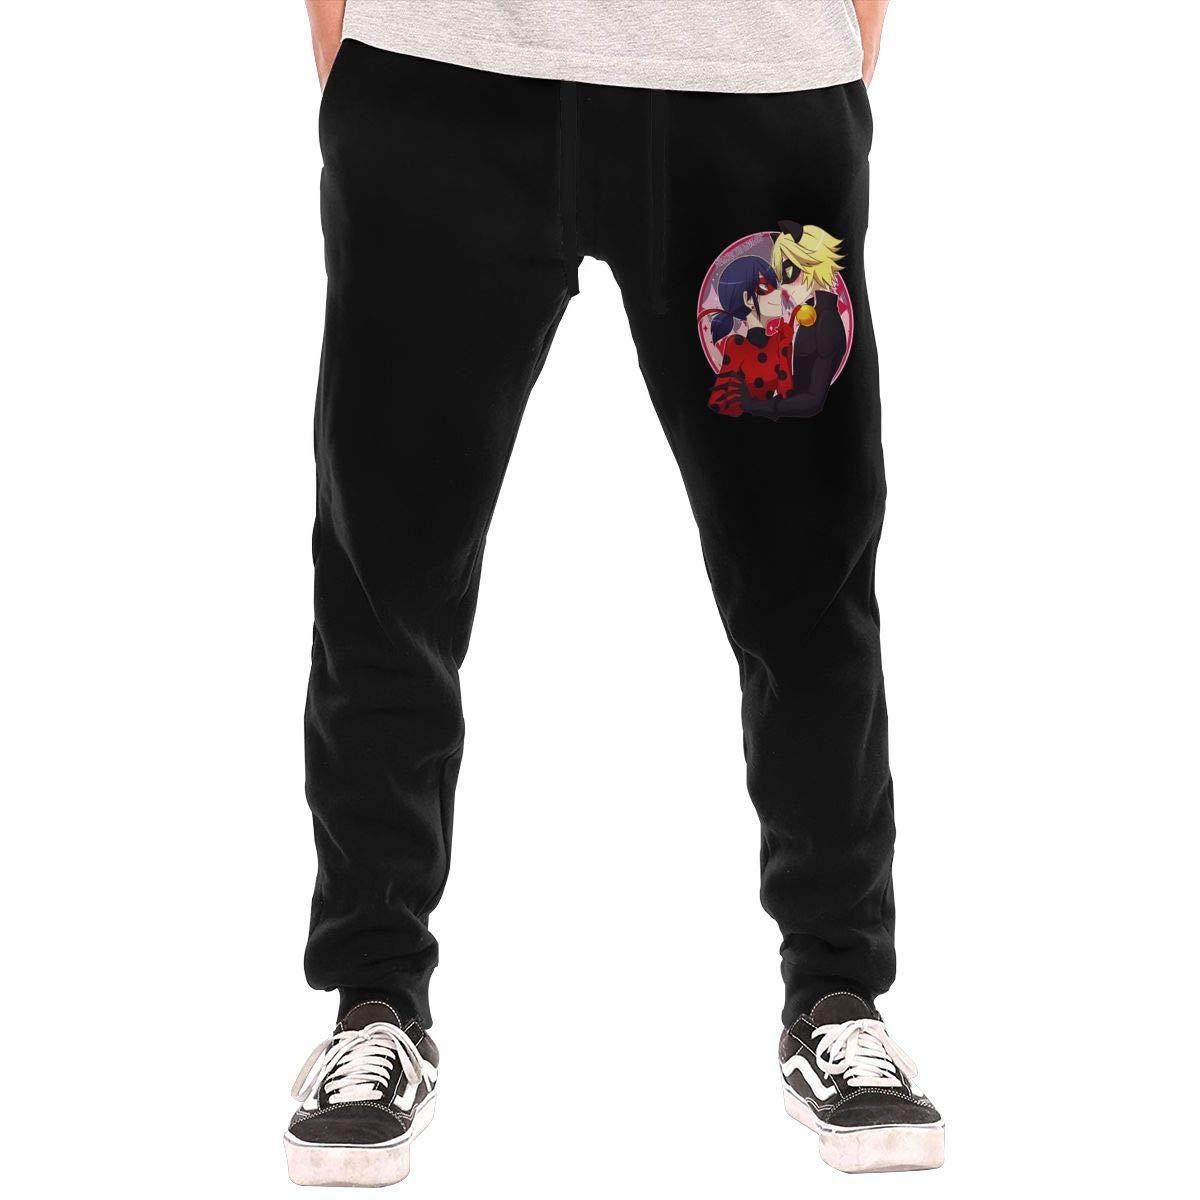 Kinggo Mens Design Miraculous.Ladybug New with Pockets Gym Pants Black